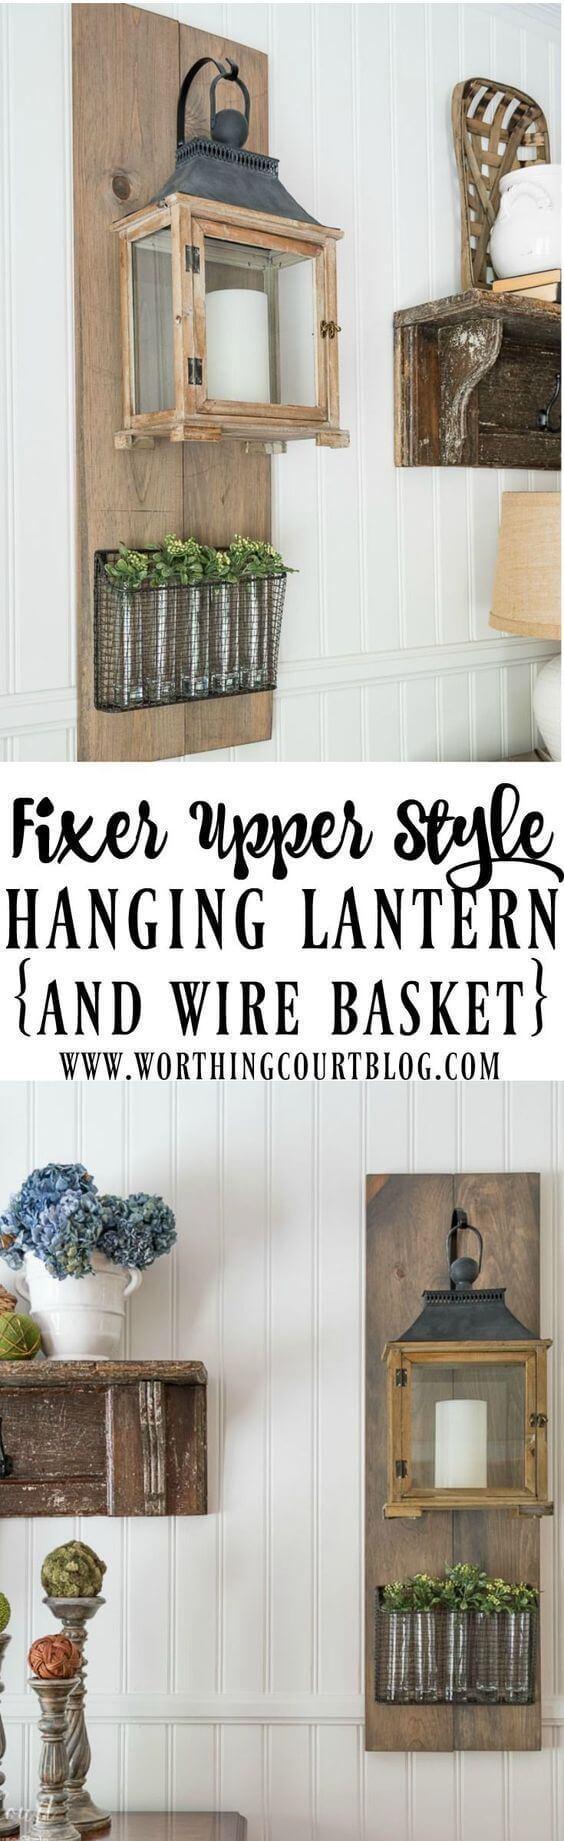 Wall-Hanging Lantern and Plant Display